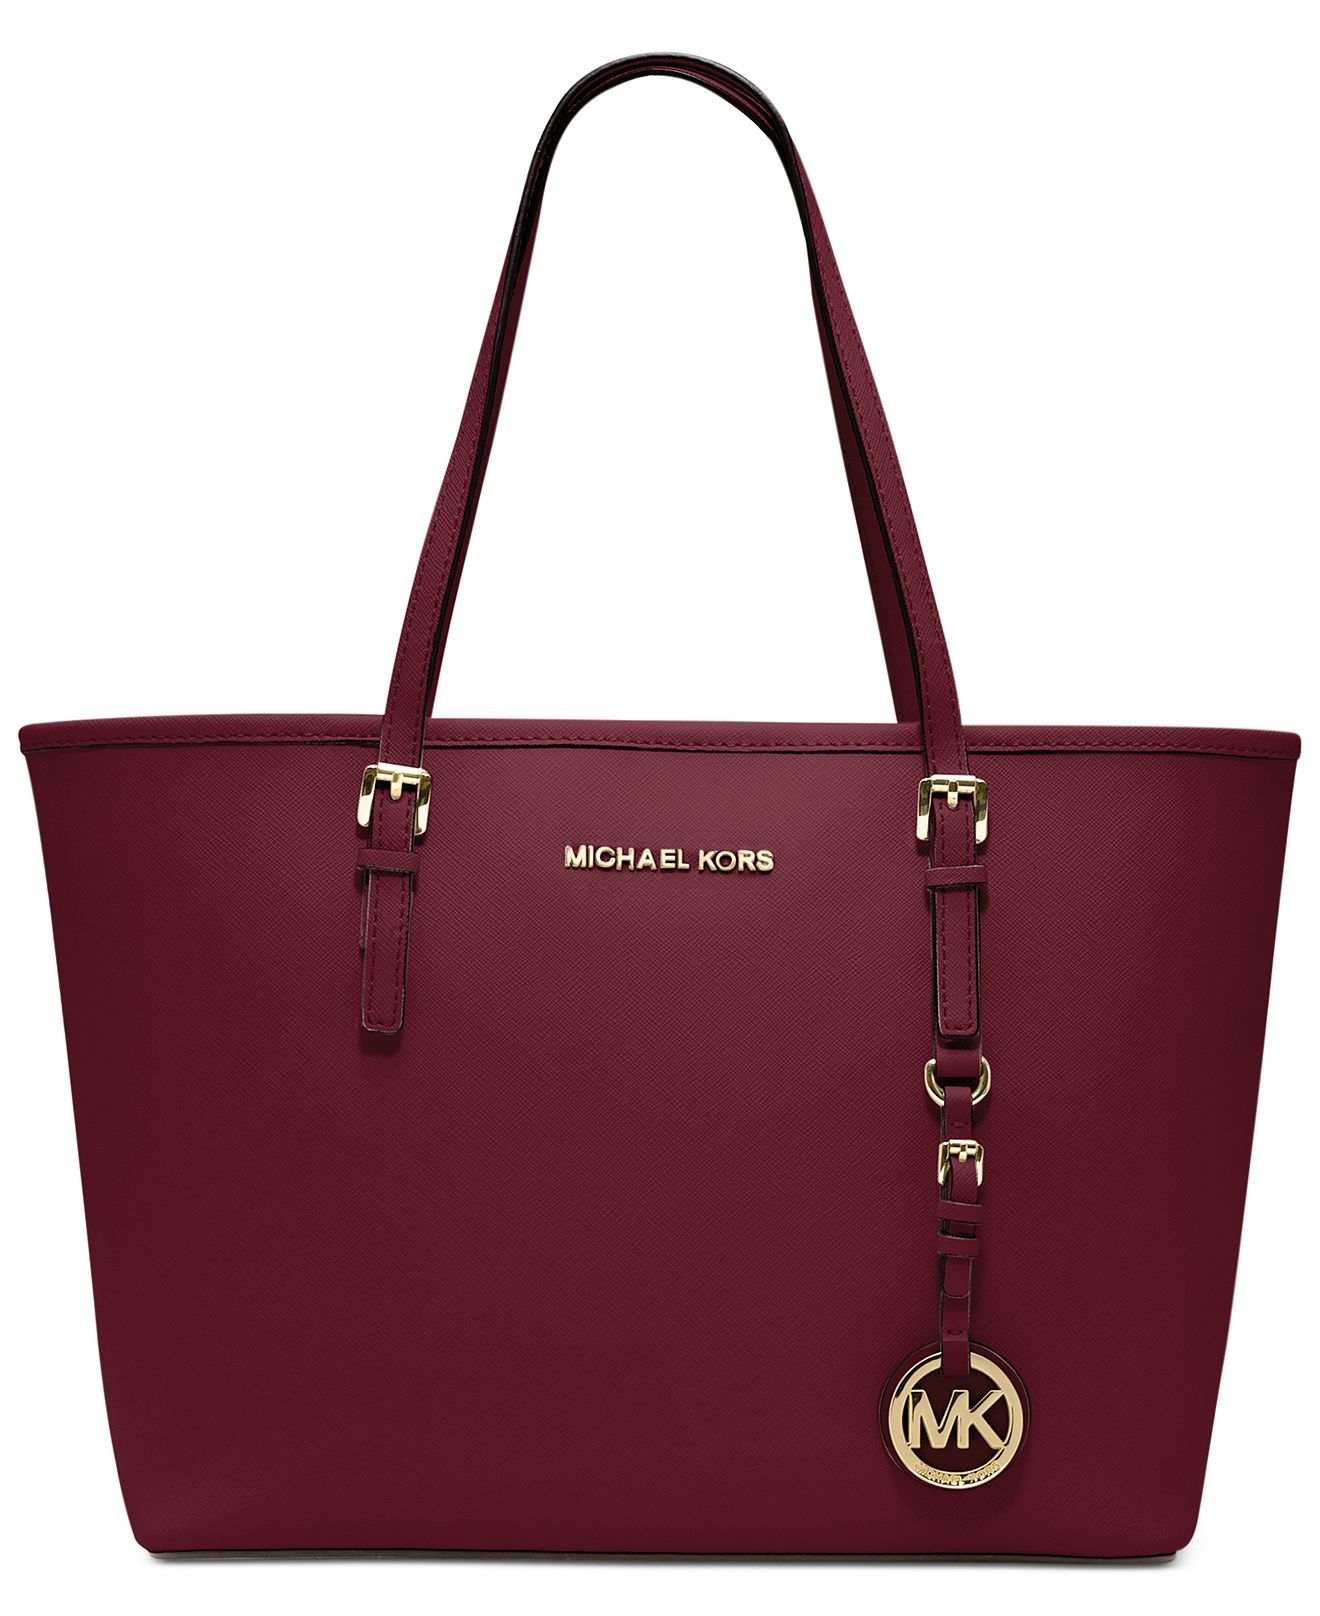 MICHAEL Michael Kors Handbag, Jet Set Travel Small Tote ...